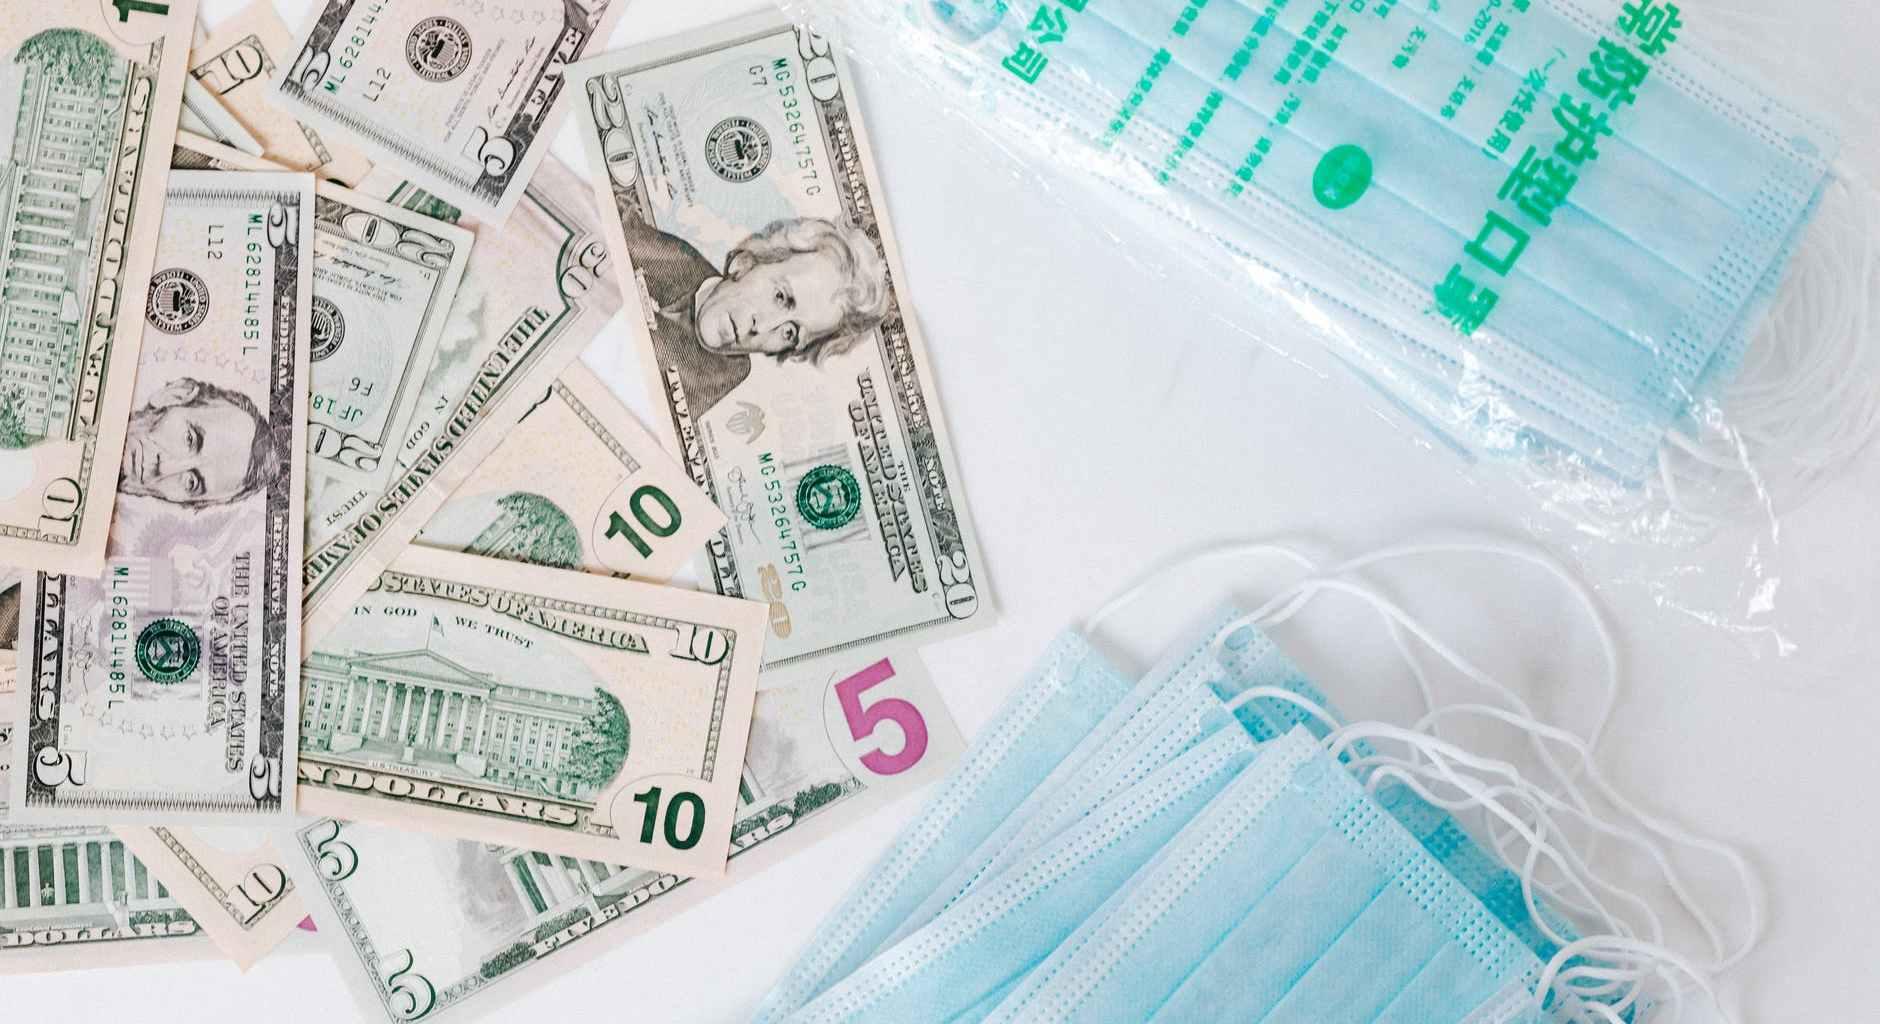 set of american cash money and medical facial masks